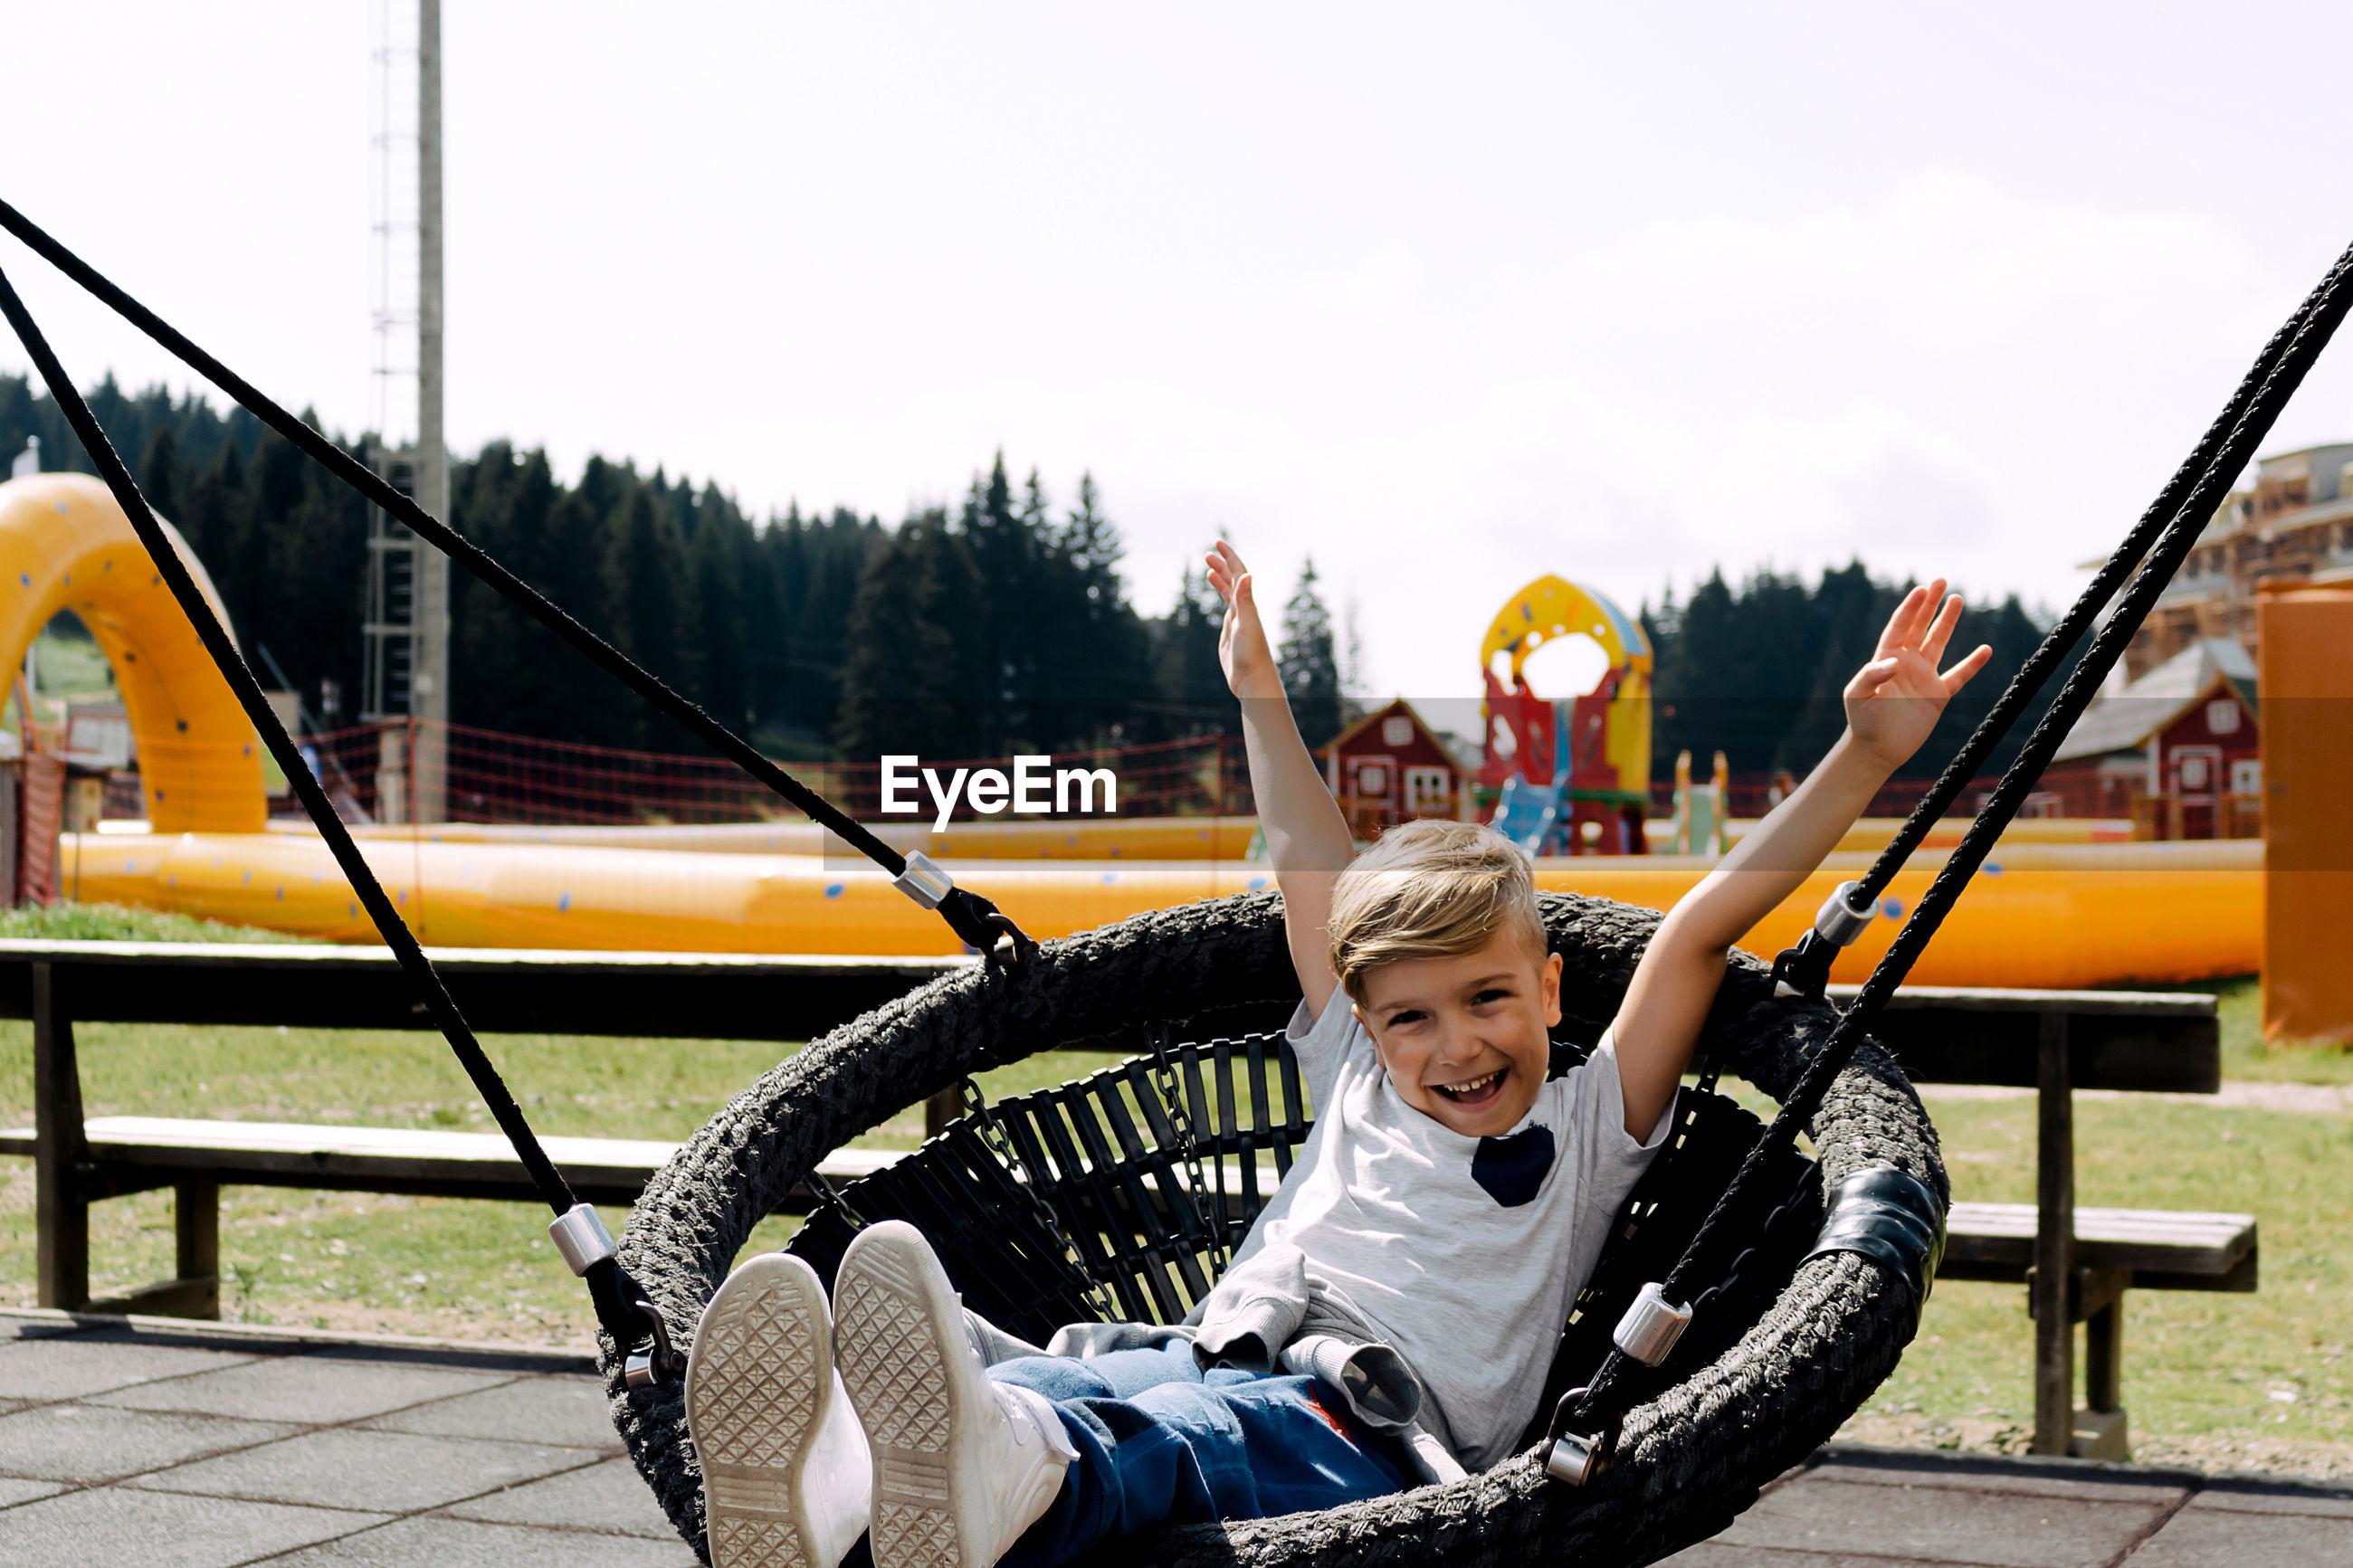 HAPPY BOY SITTING ON SLIDE AT PLAYGROUND AGAINST SKY